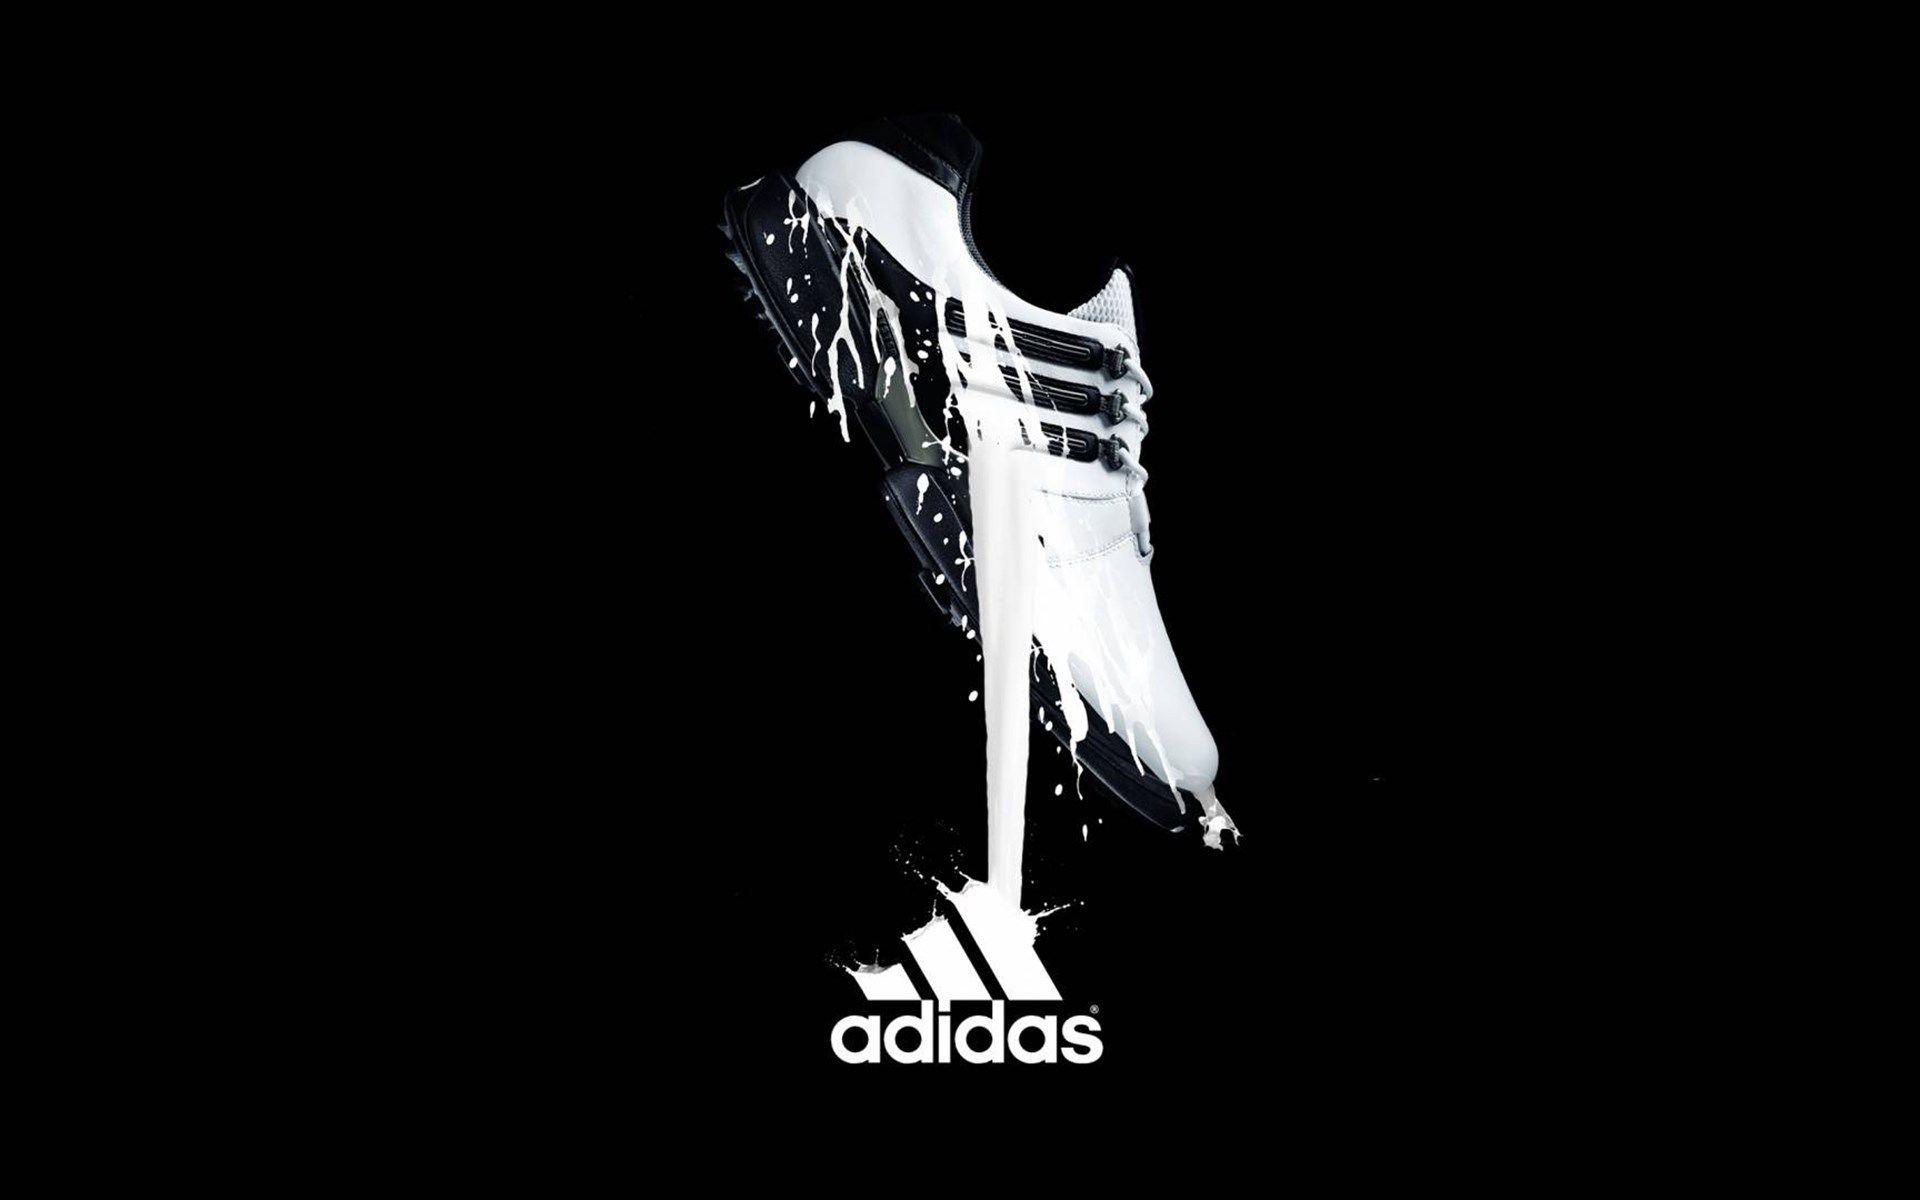 adidas logo 3d wallpaper basketball